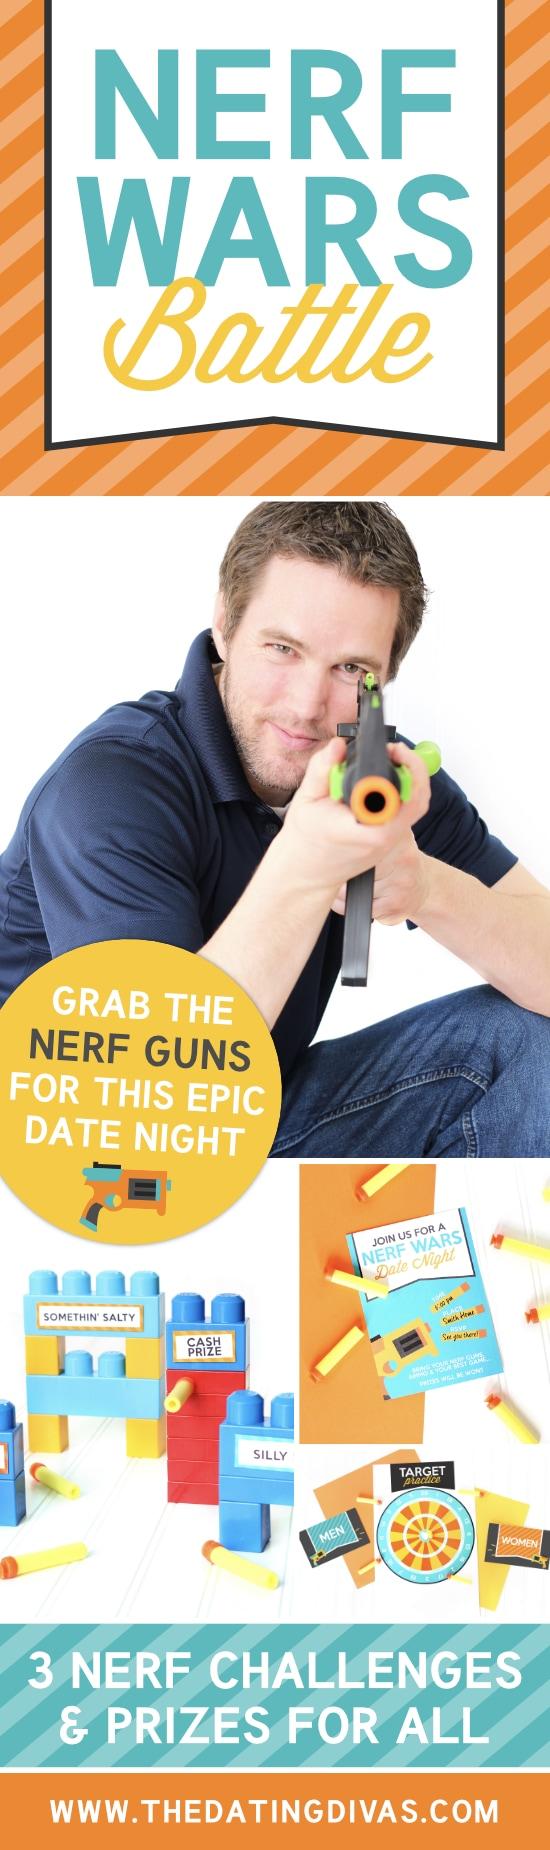 Nerf Wars Battle